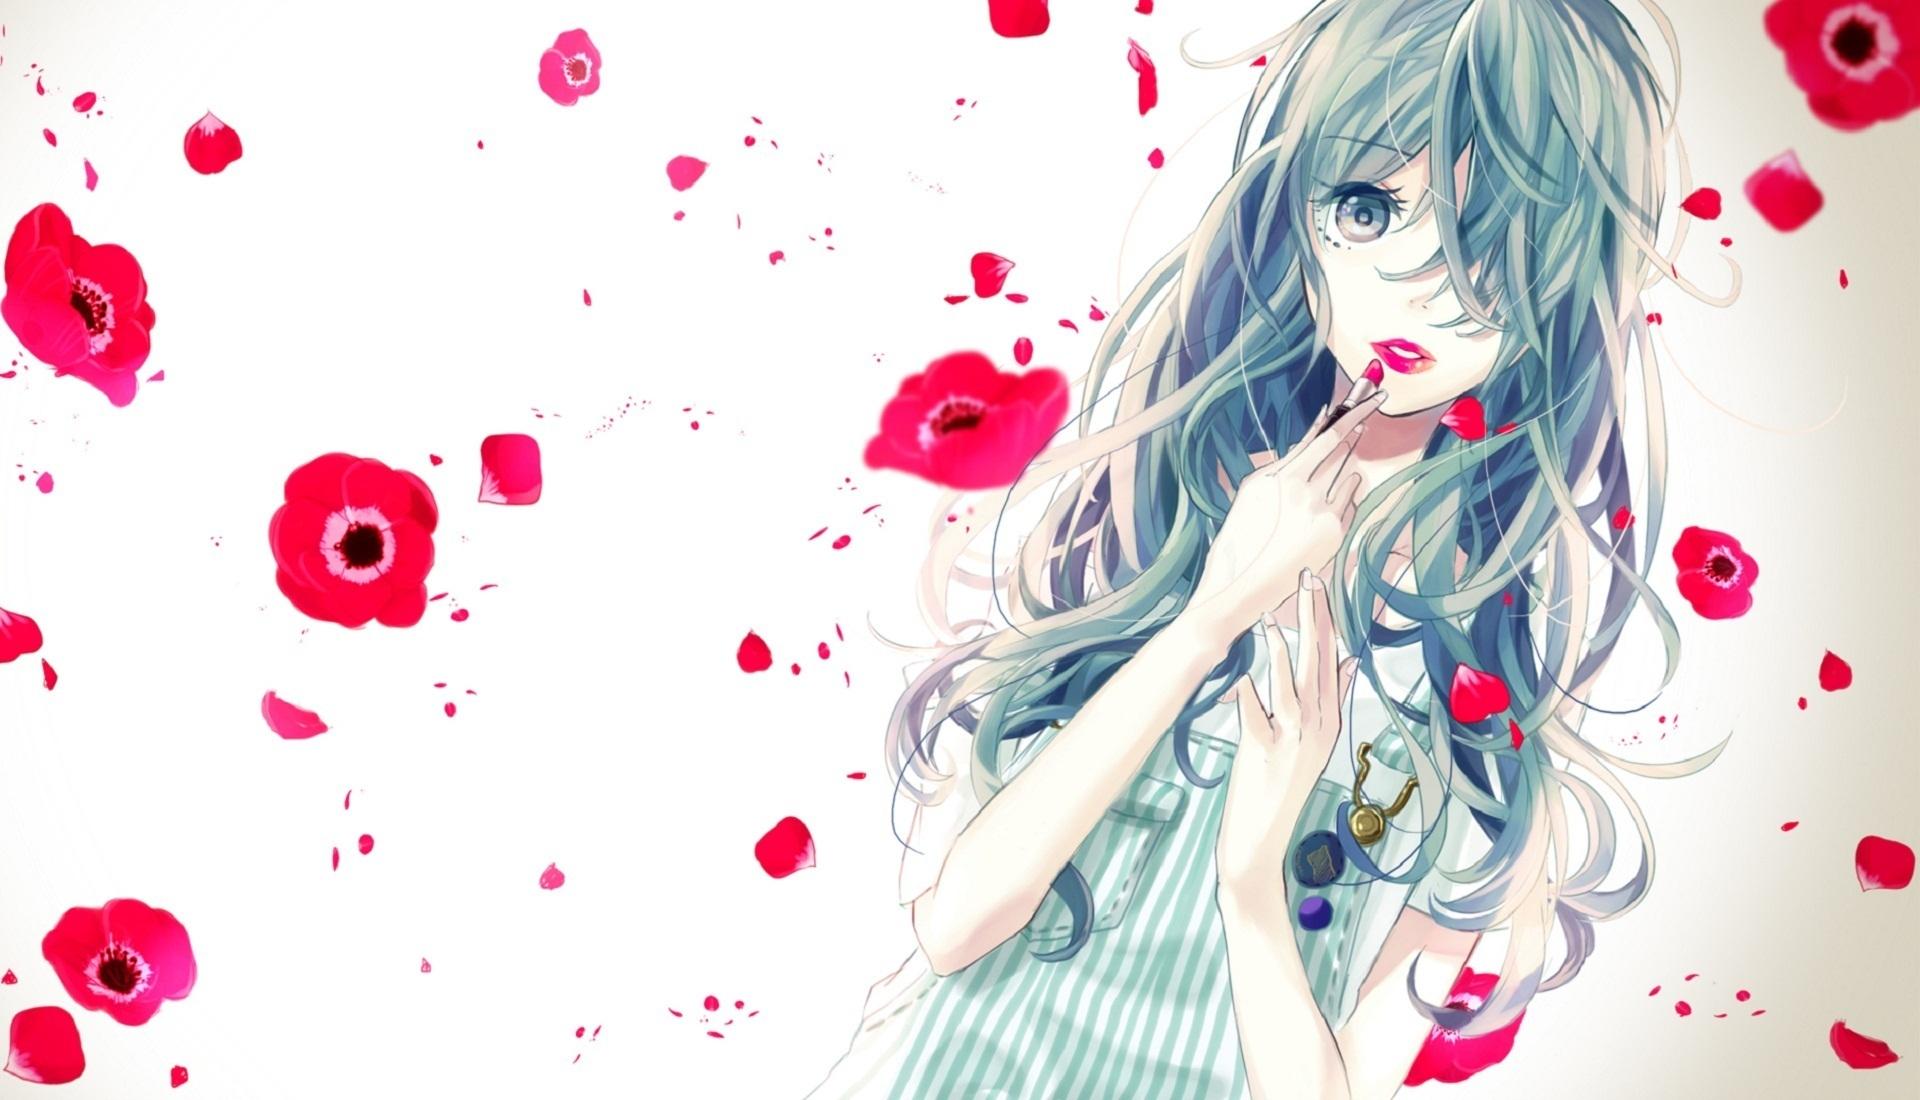 Sweet Girl And Boy Hd Wallpaper Girly Wallpapers Hd Free Download Pixelstalk Net